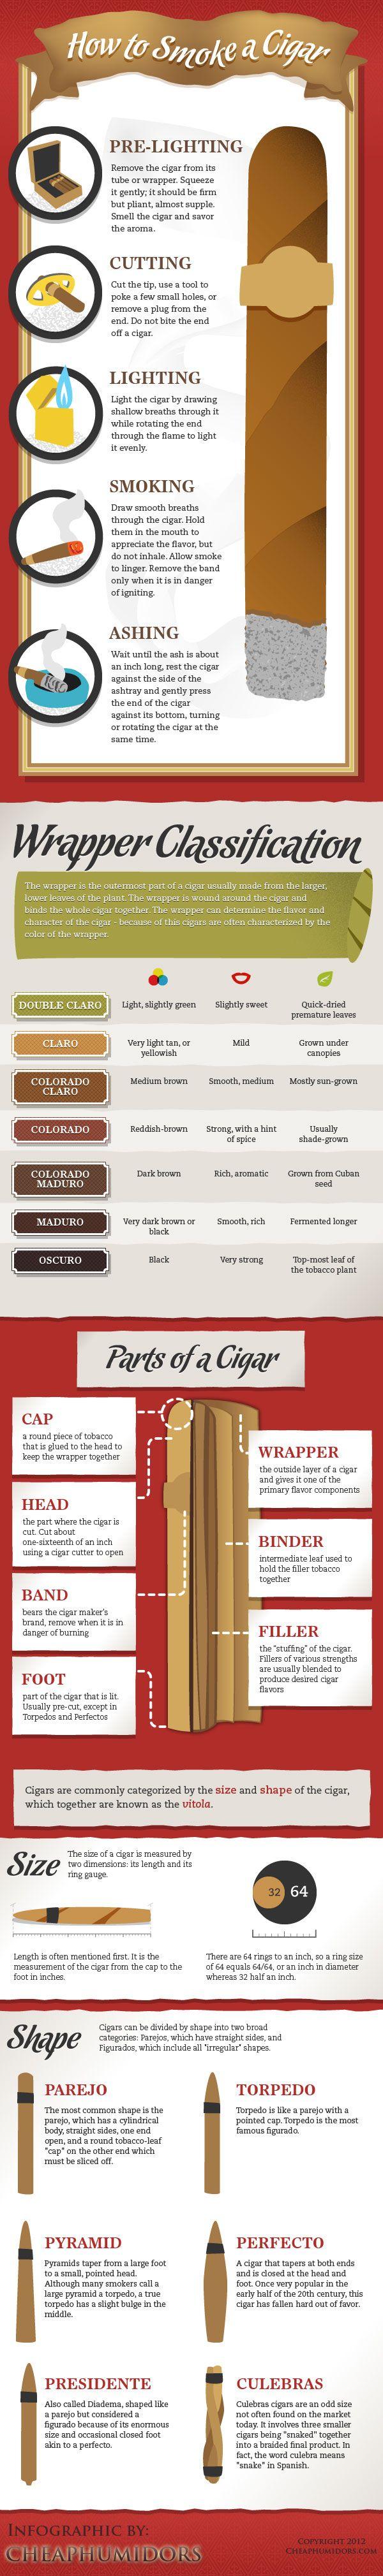 How-to-Smoke-a-Cigar